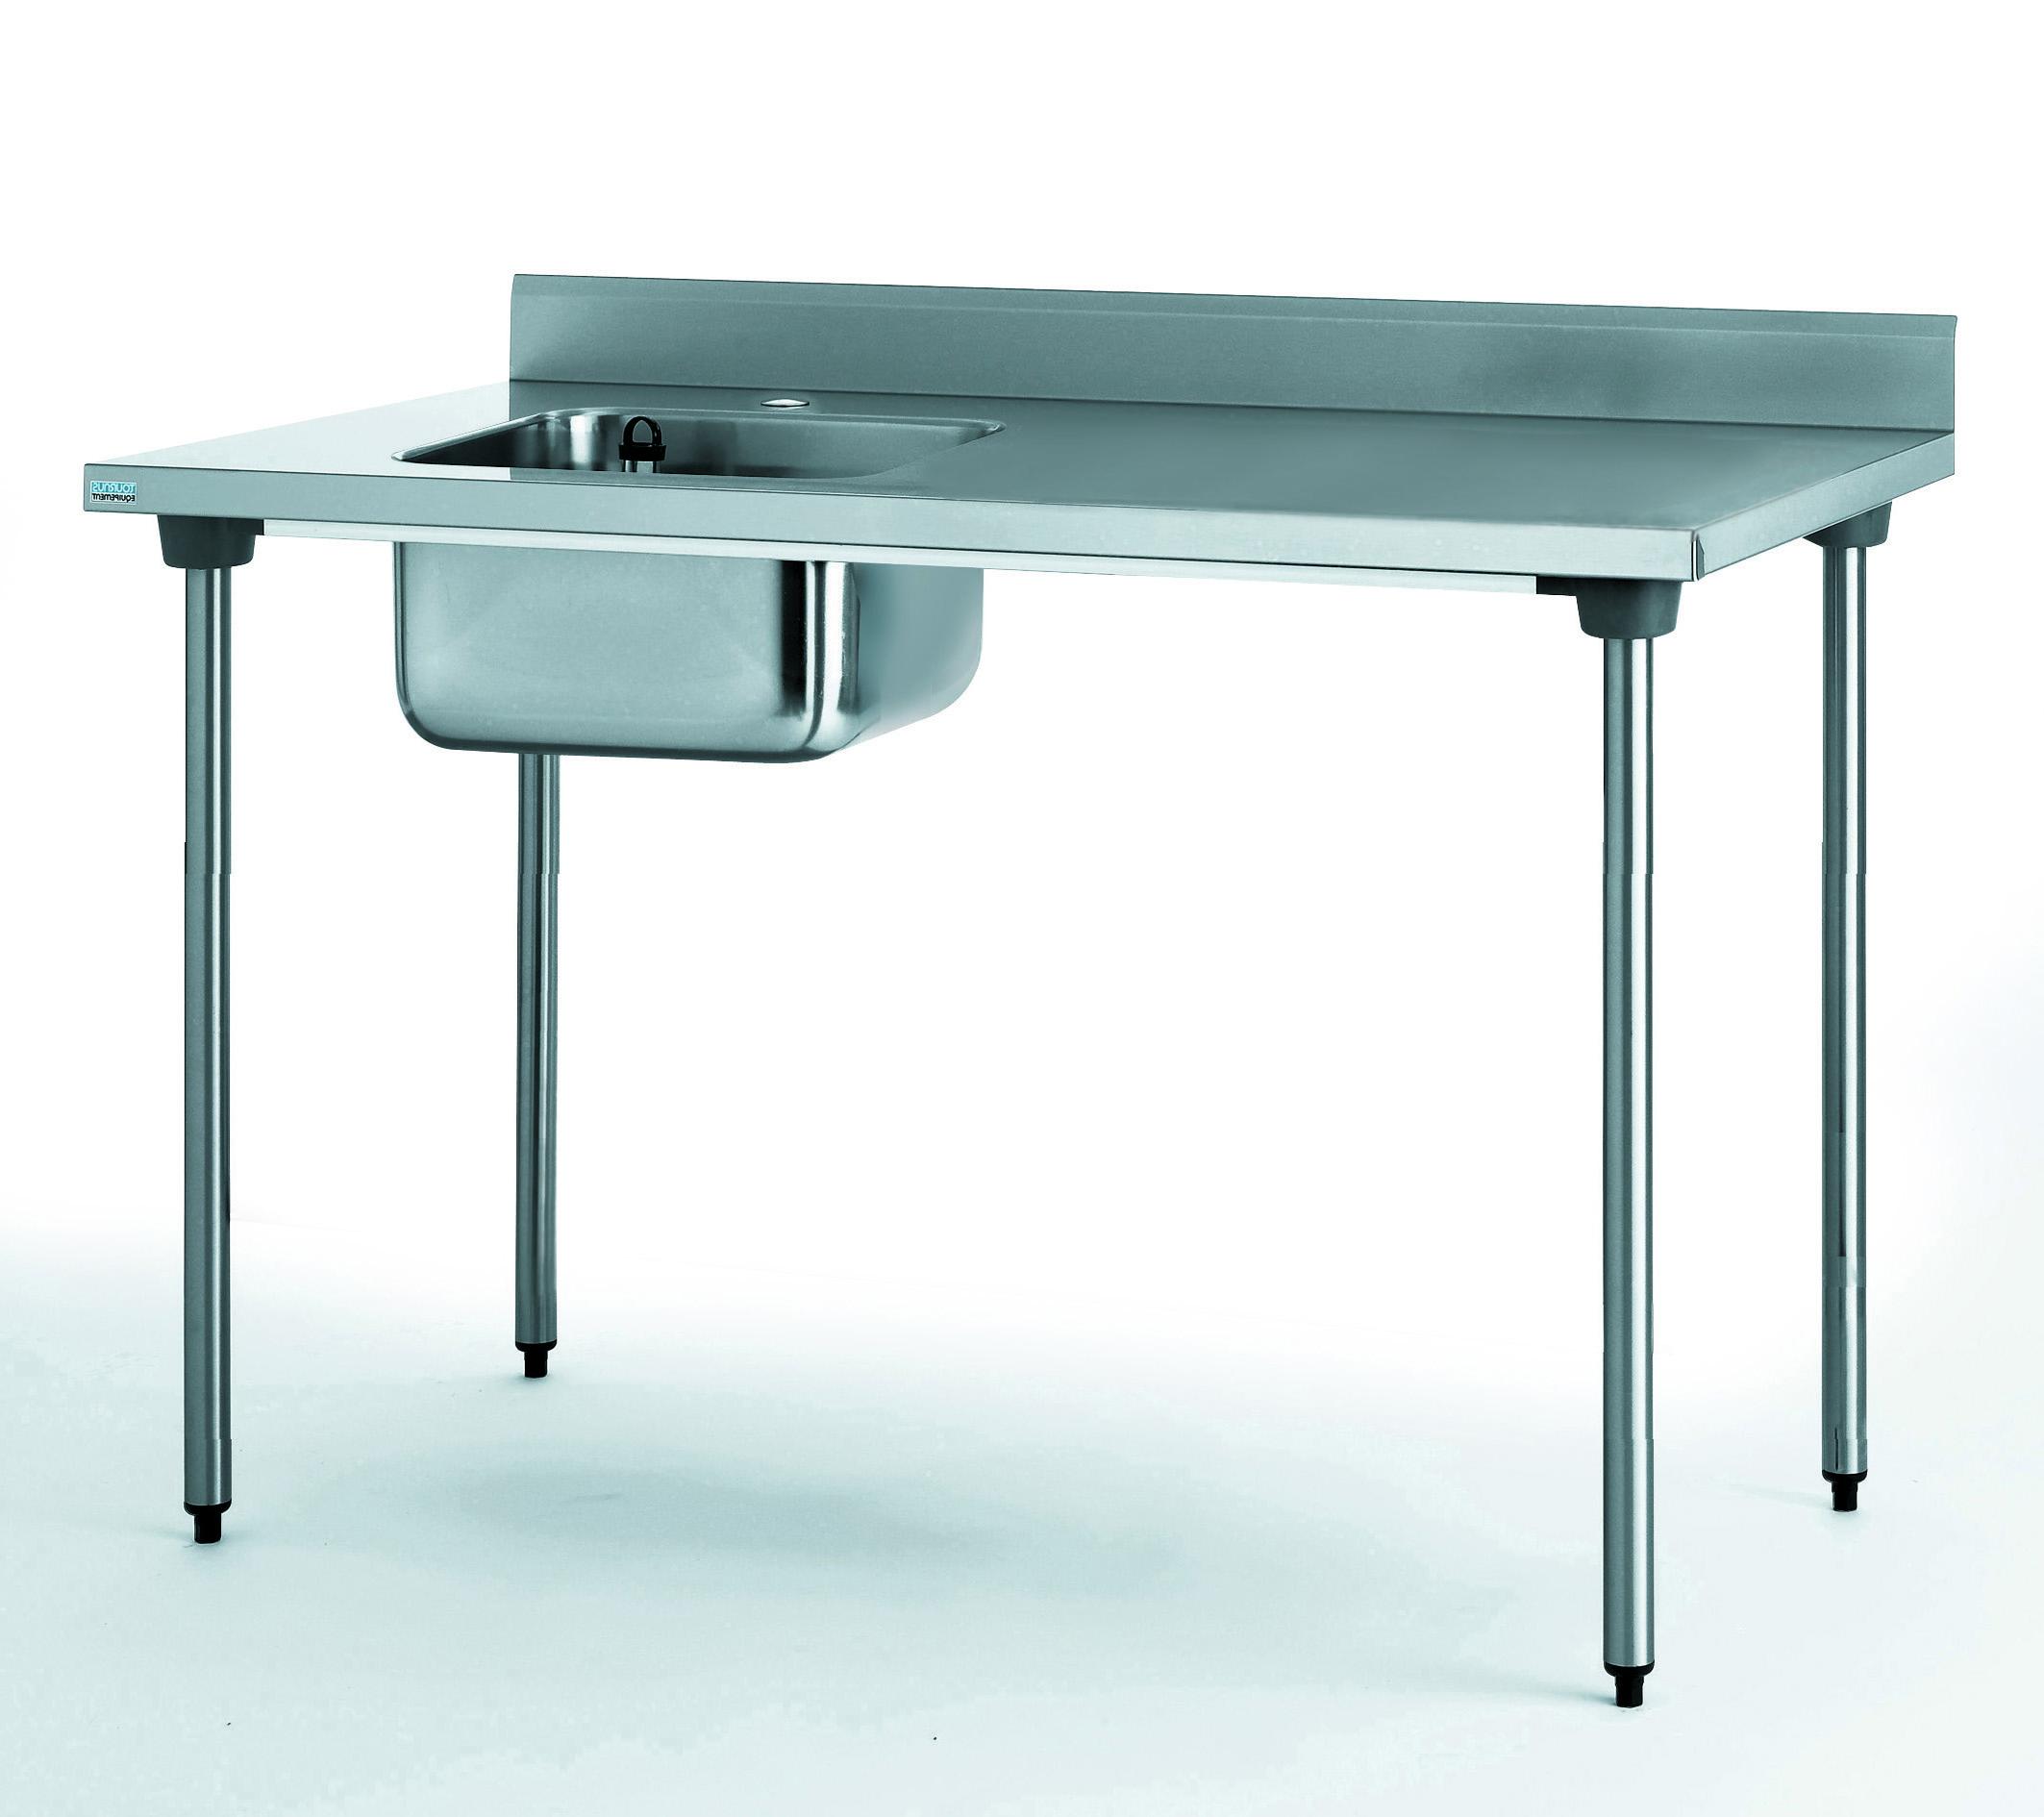 TABLE DU CHEF CHR 700X1200 BAC A GAUCHE SANS ROBINET